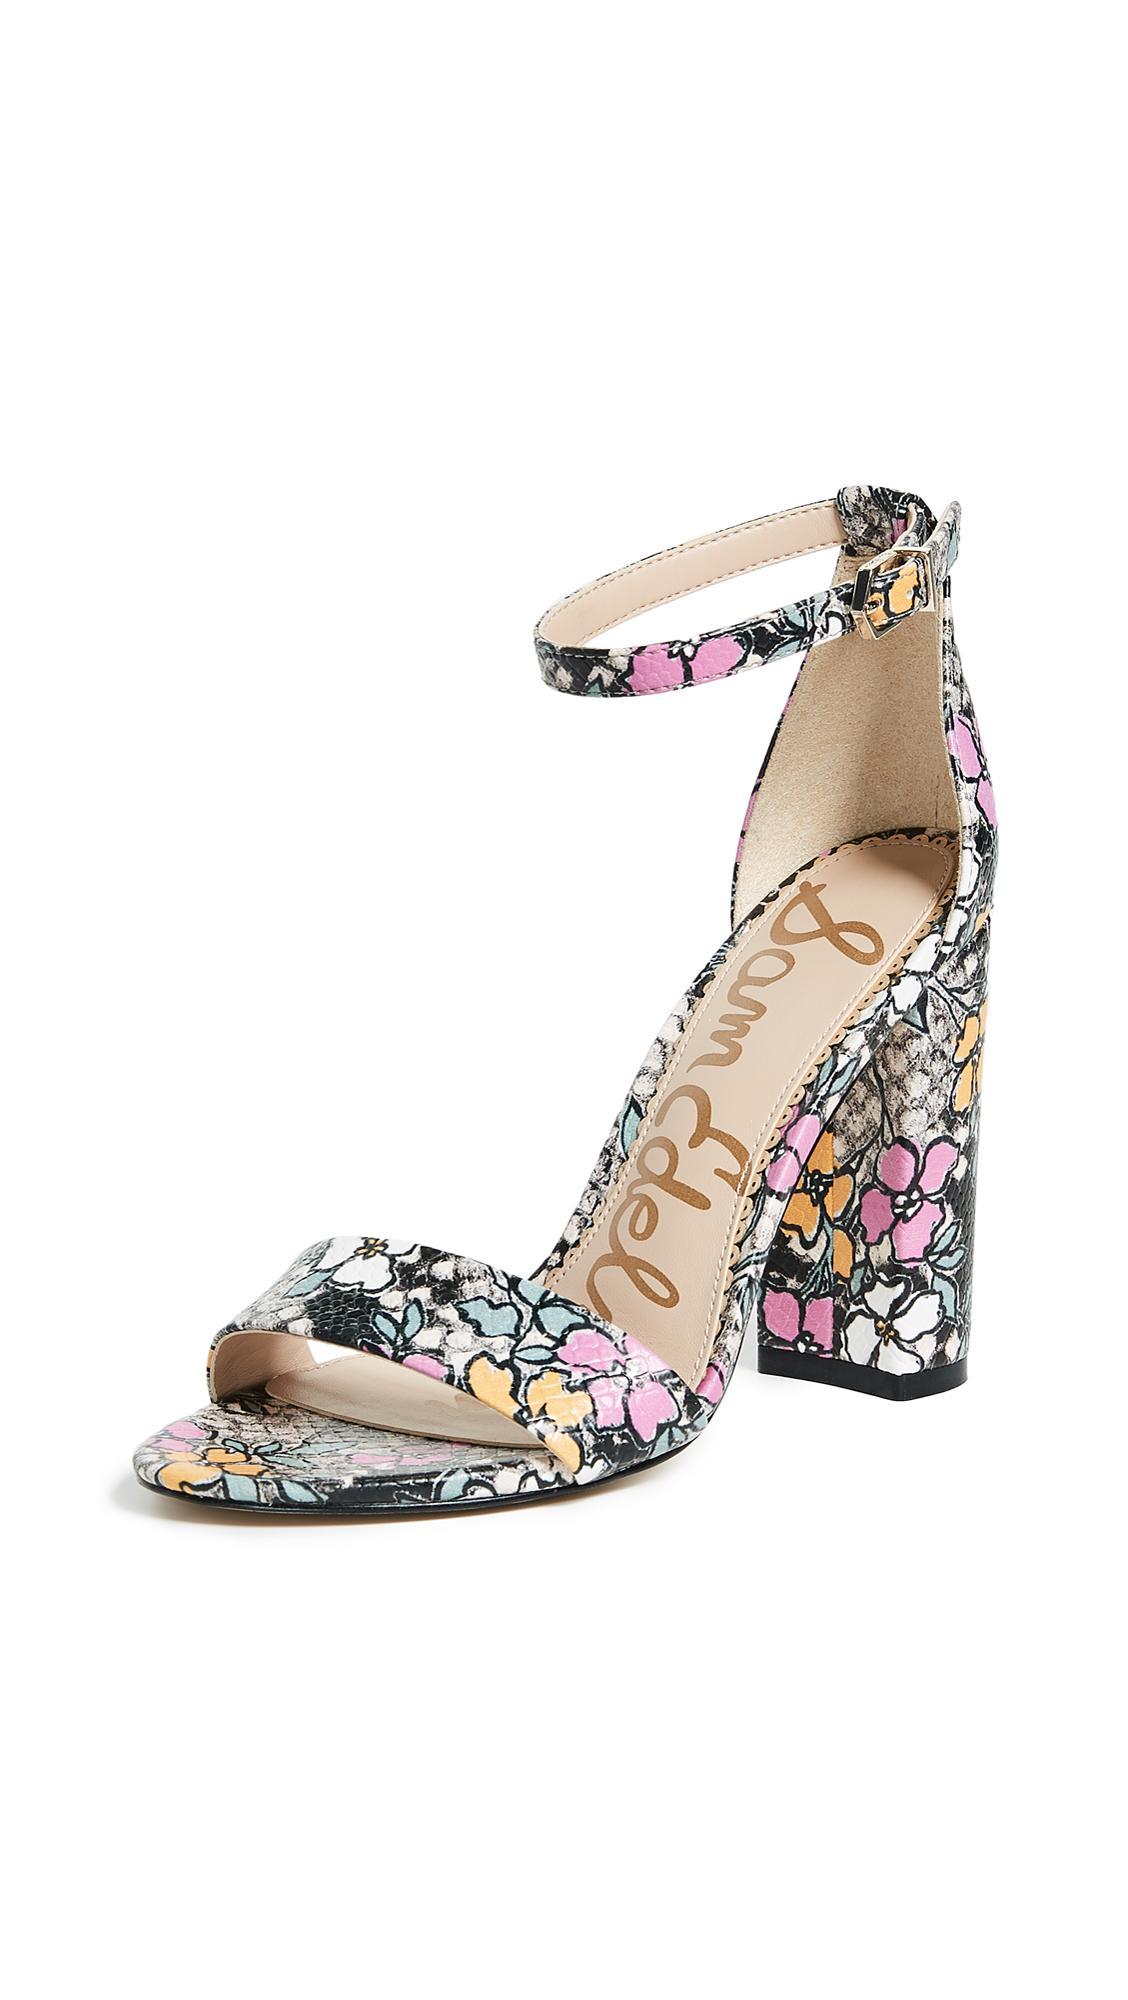 08e387bf6e53b0 Sam Edelman Yaro Ankle Strap Sandal In Bright Multi